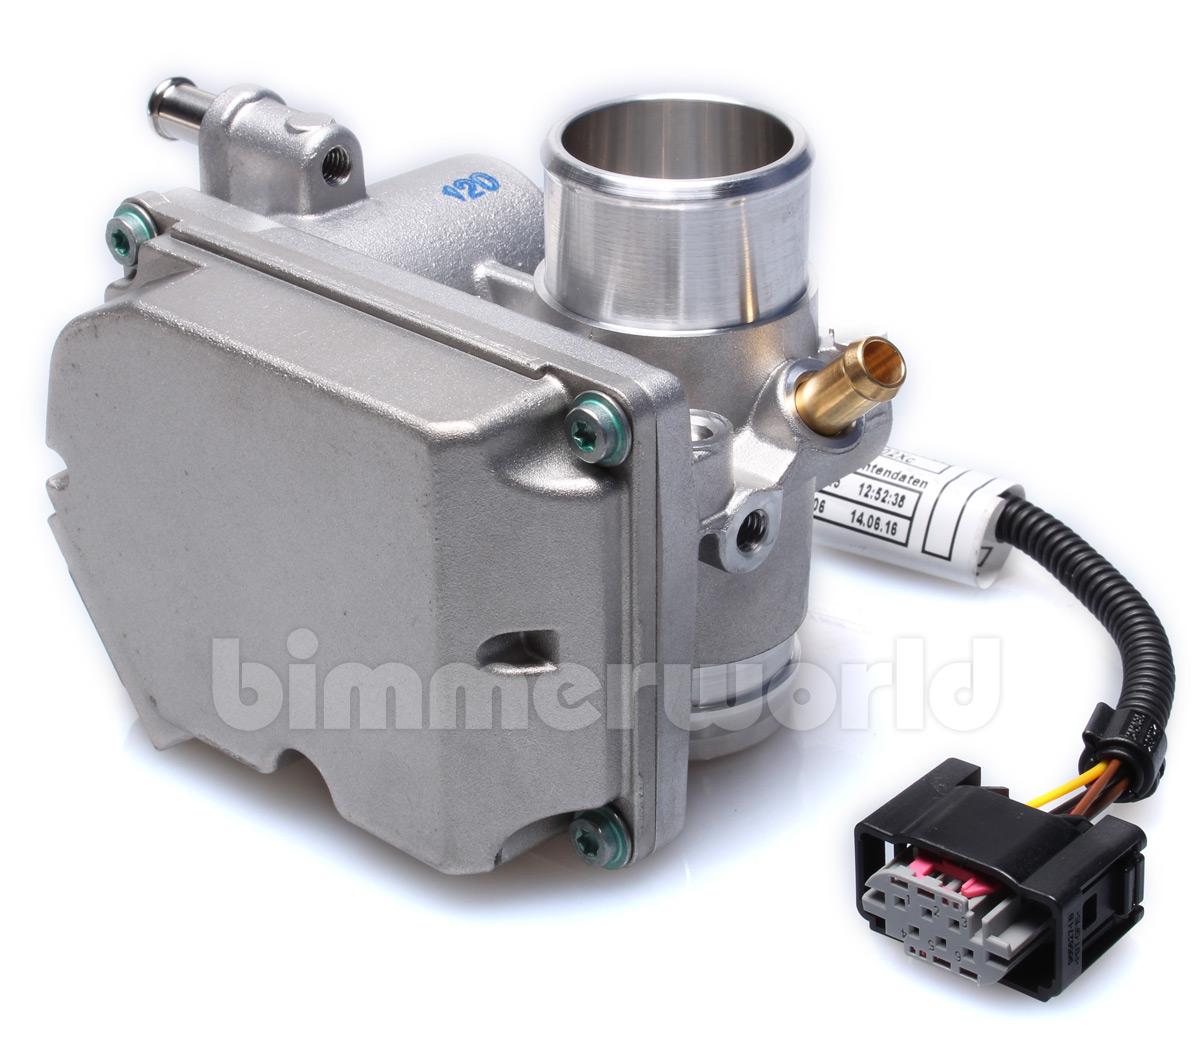 hight resolution of bmw iac valve